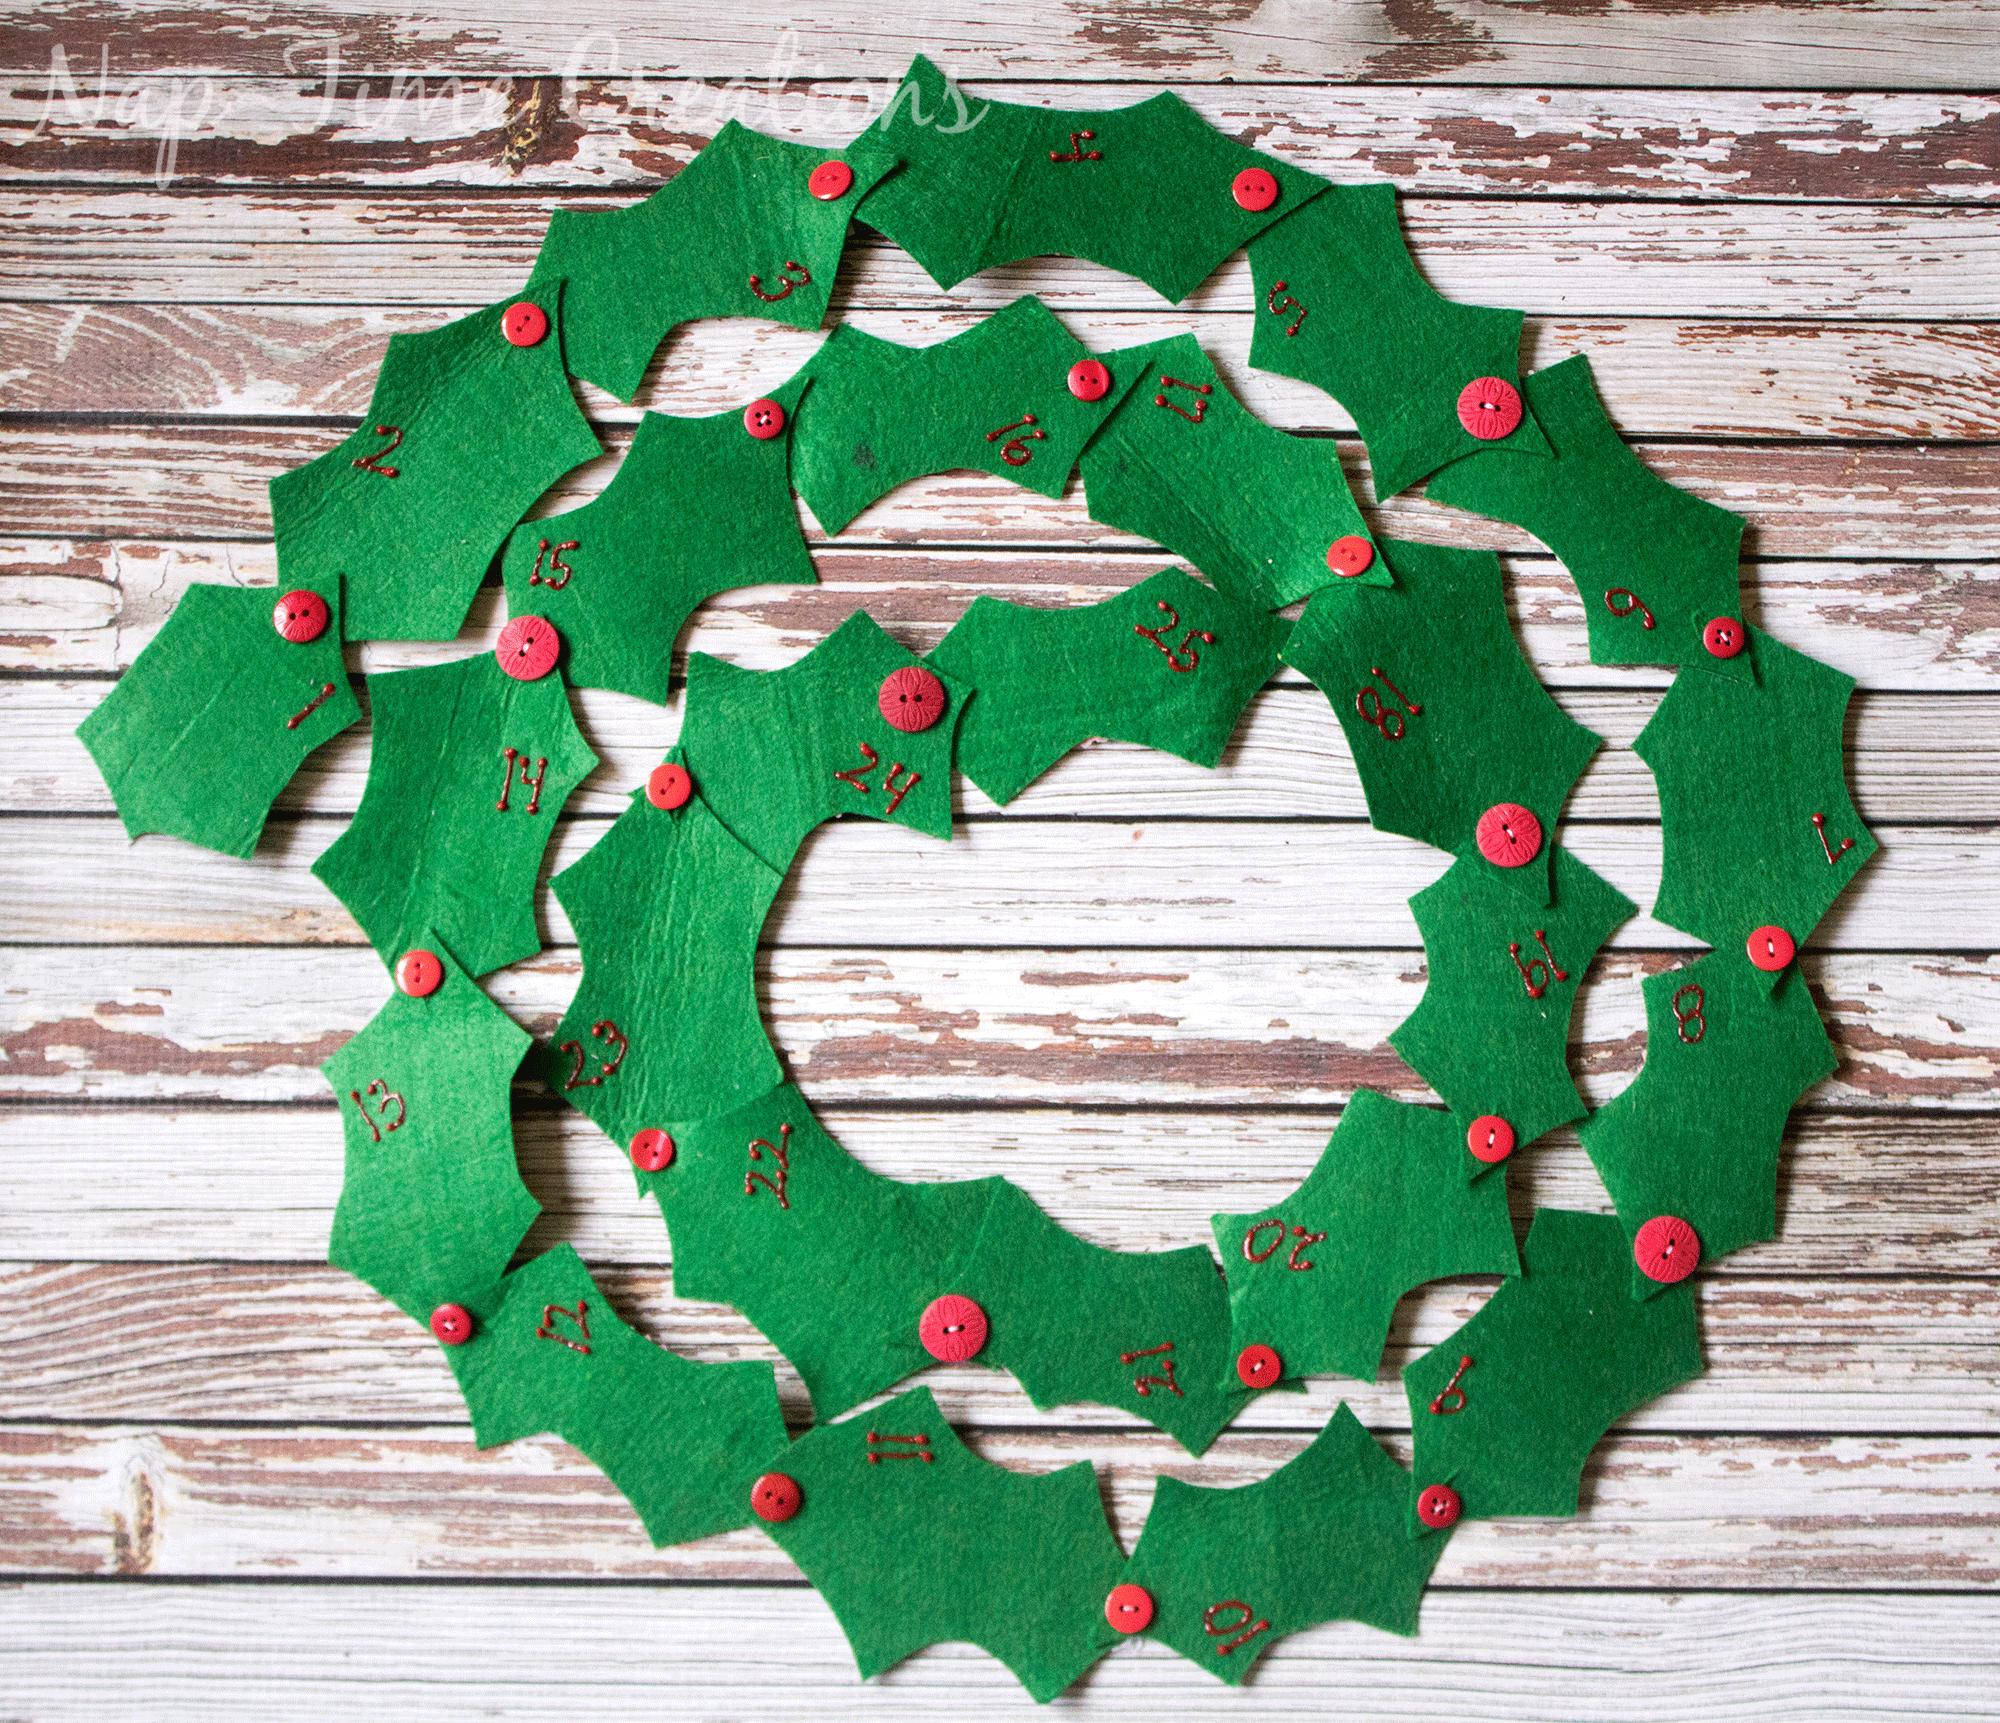 holly-jolly-christmas-countown-calendar-10